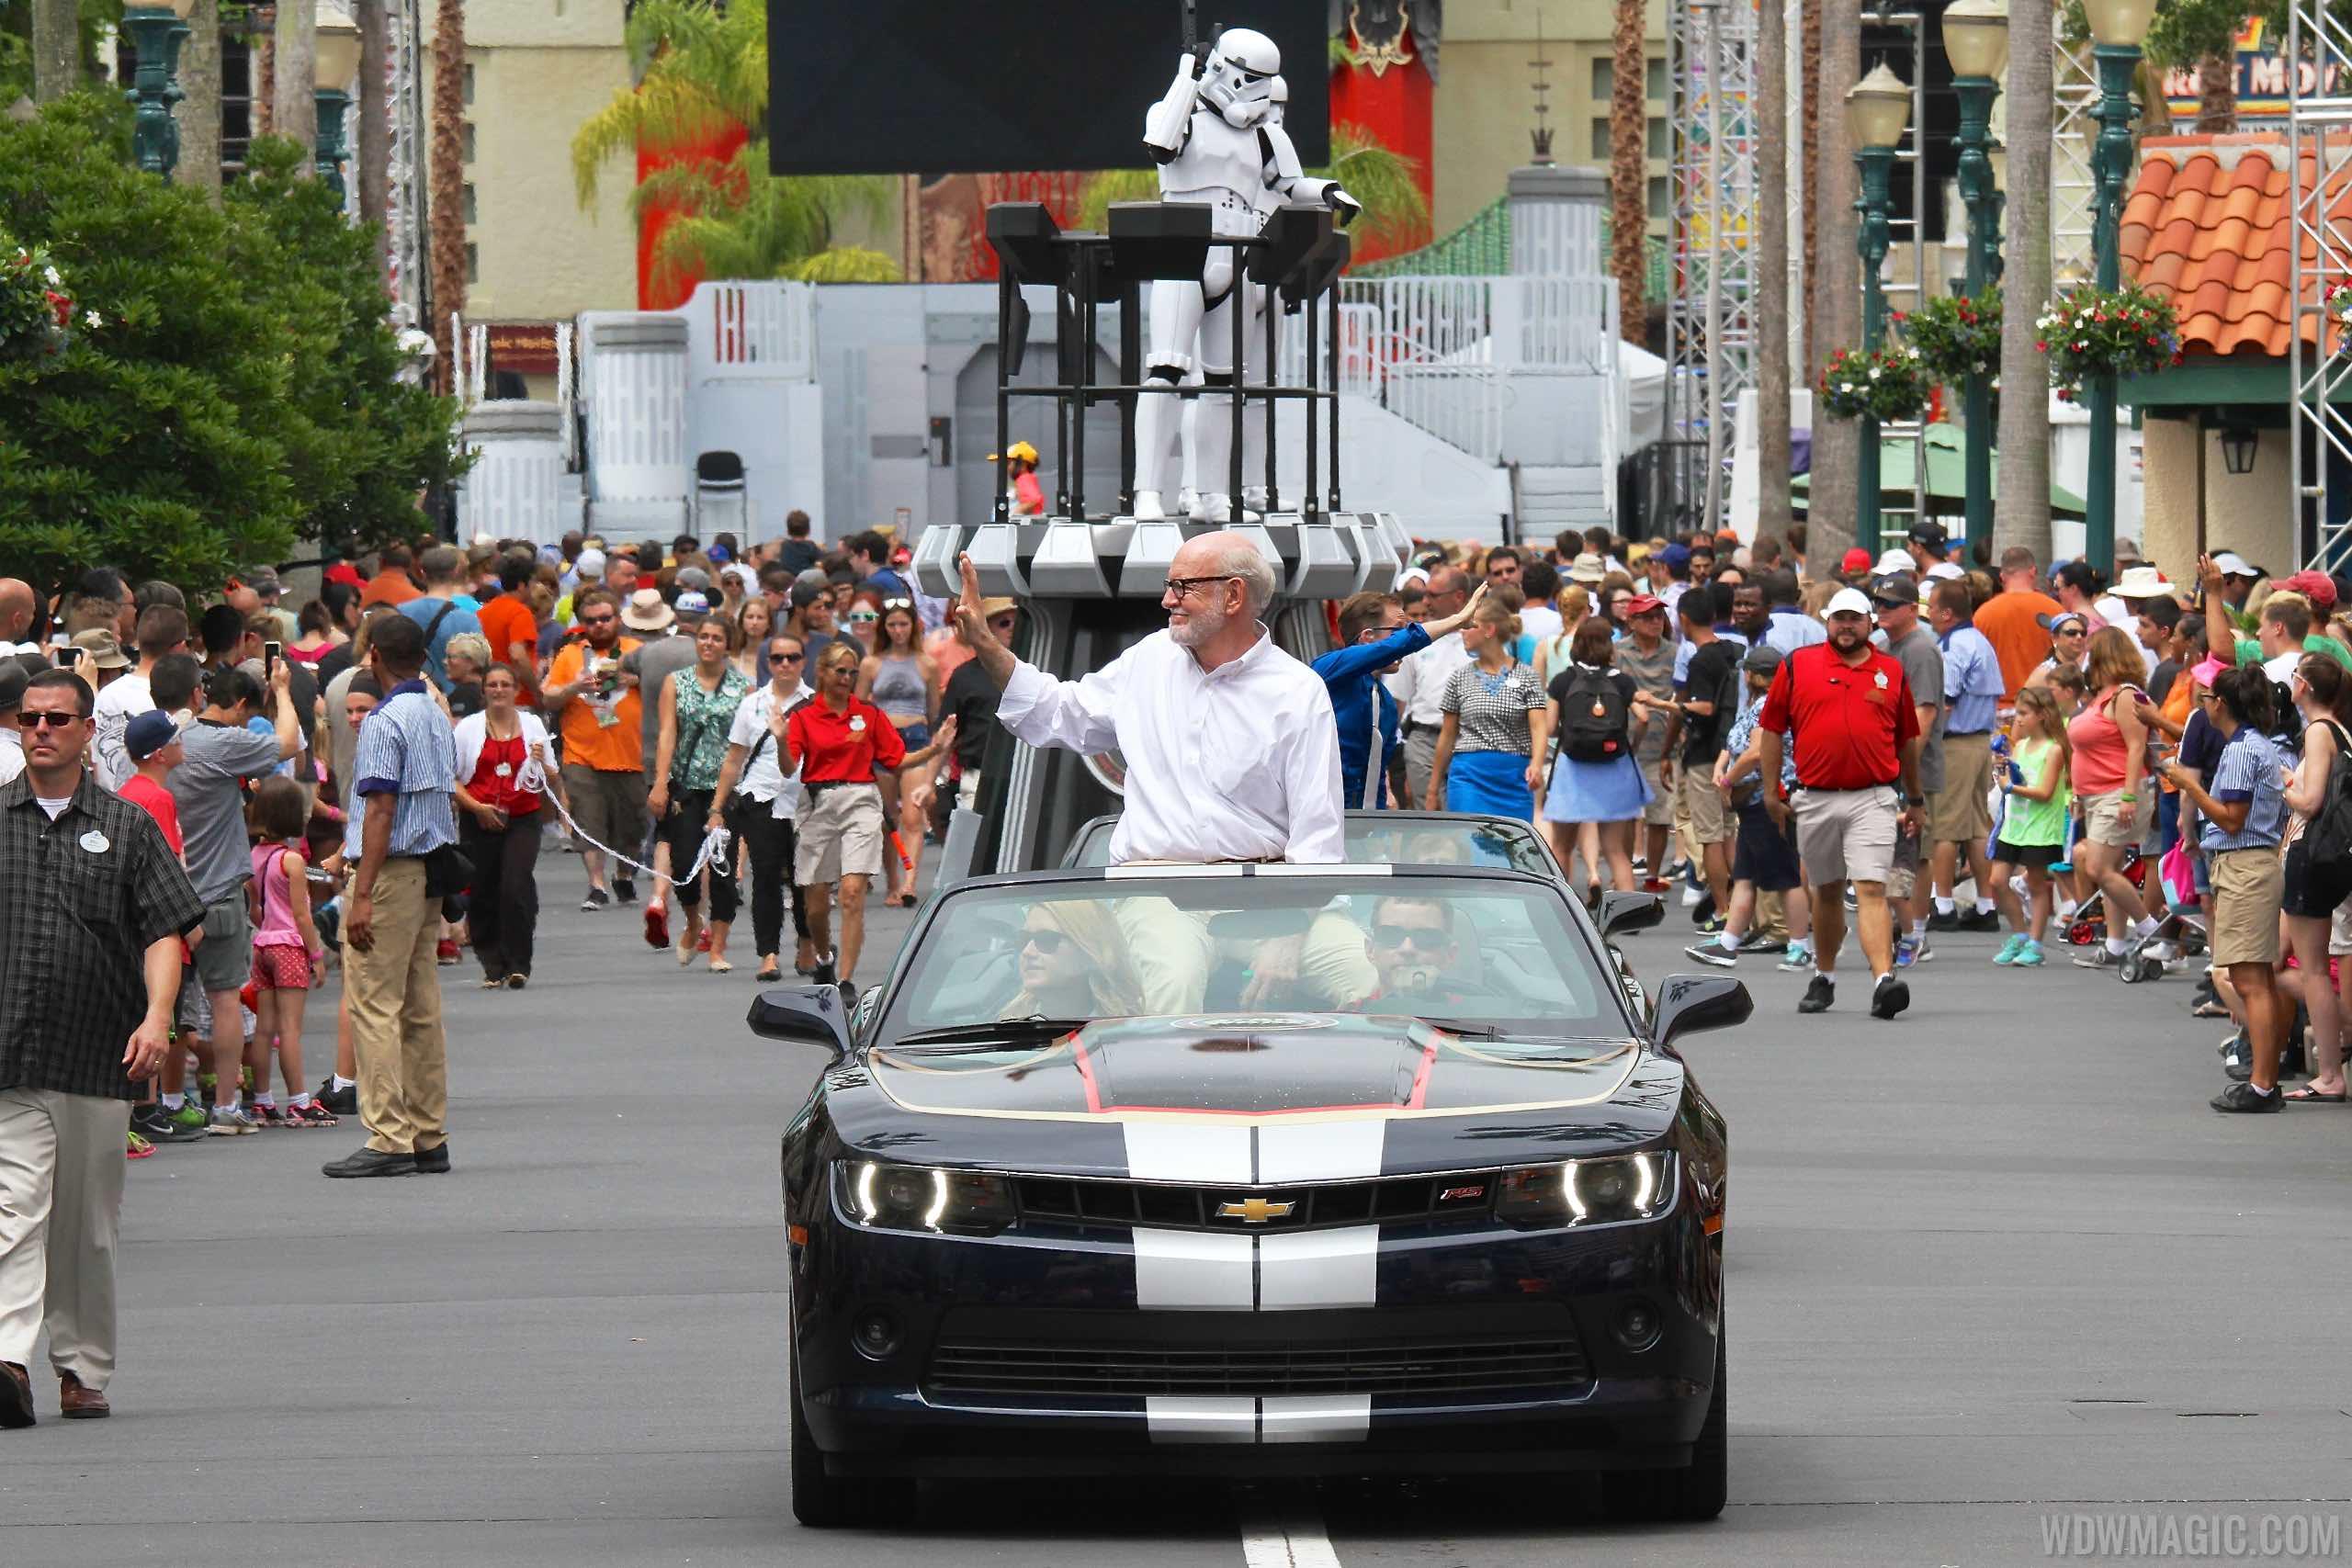 Weekend 5 Legends of the Force motorcade celebrities - Frank Oz